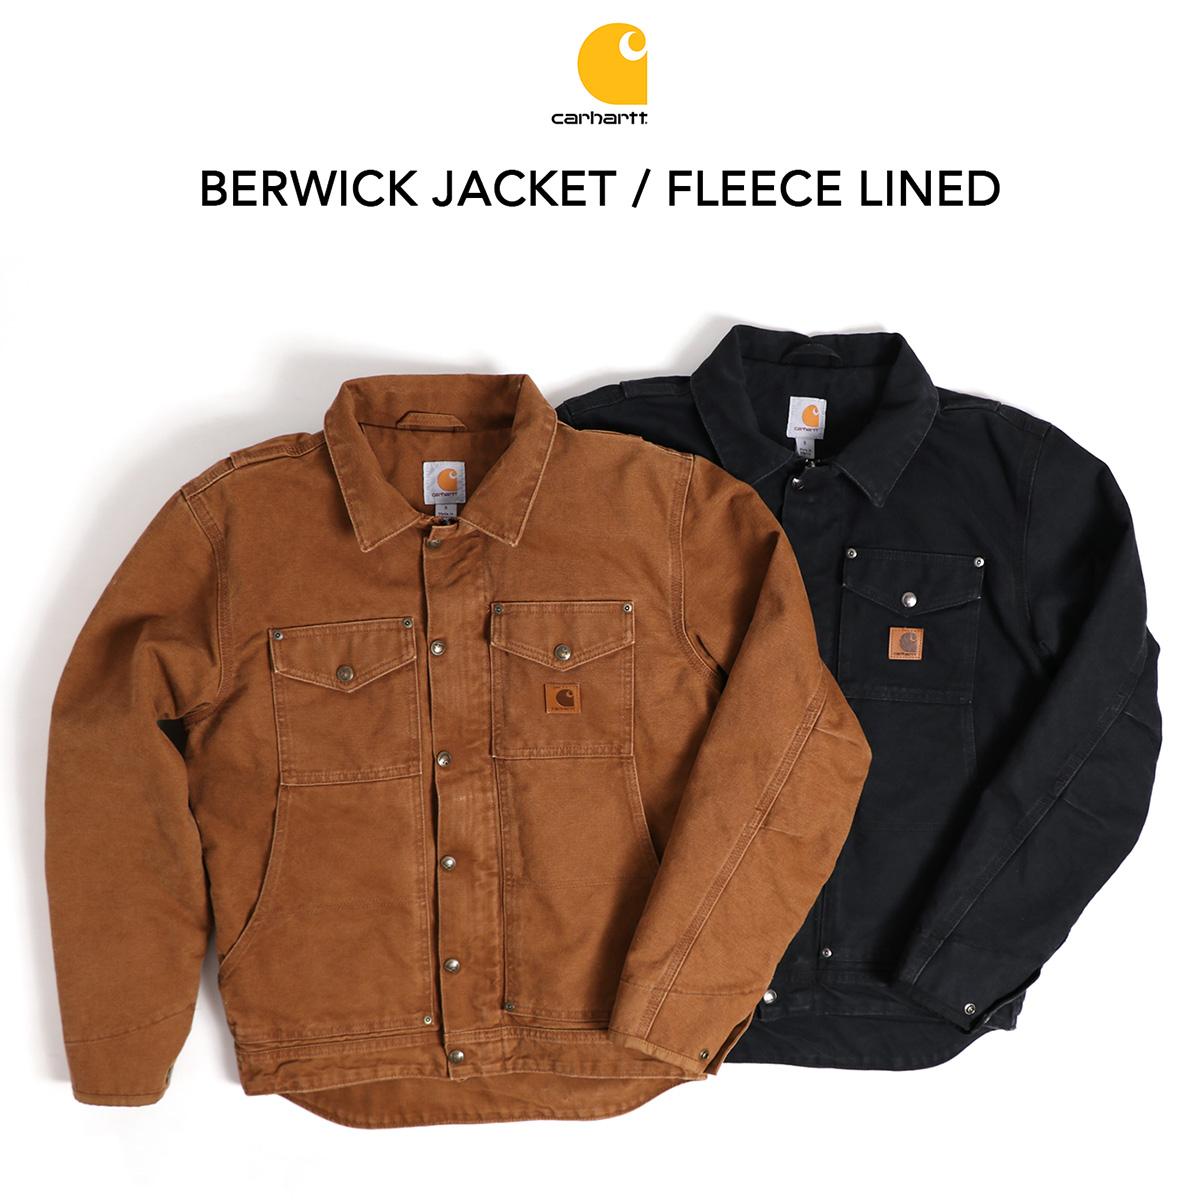 c7ccce6dcc9 Carhartt Berwick Fleece Lined Jacket - Image Of Jacket